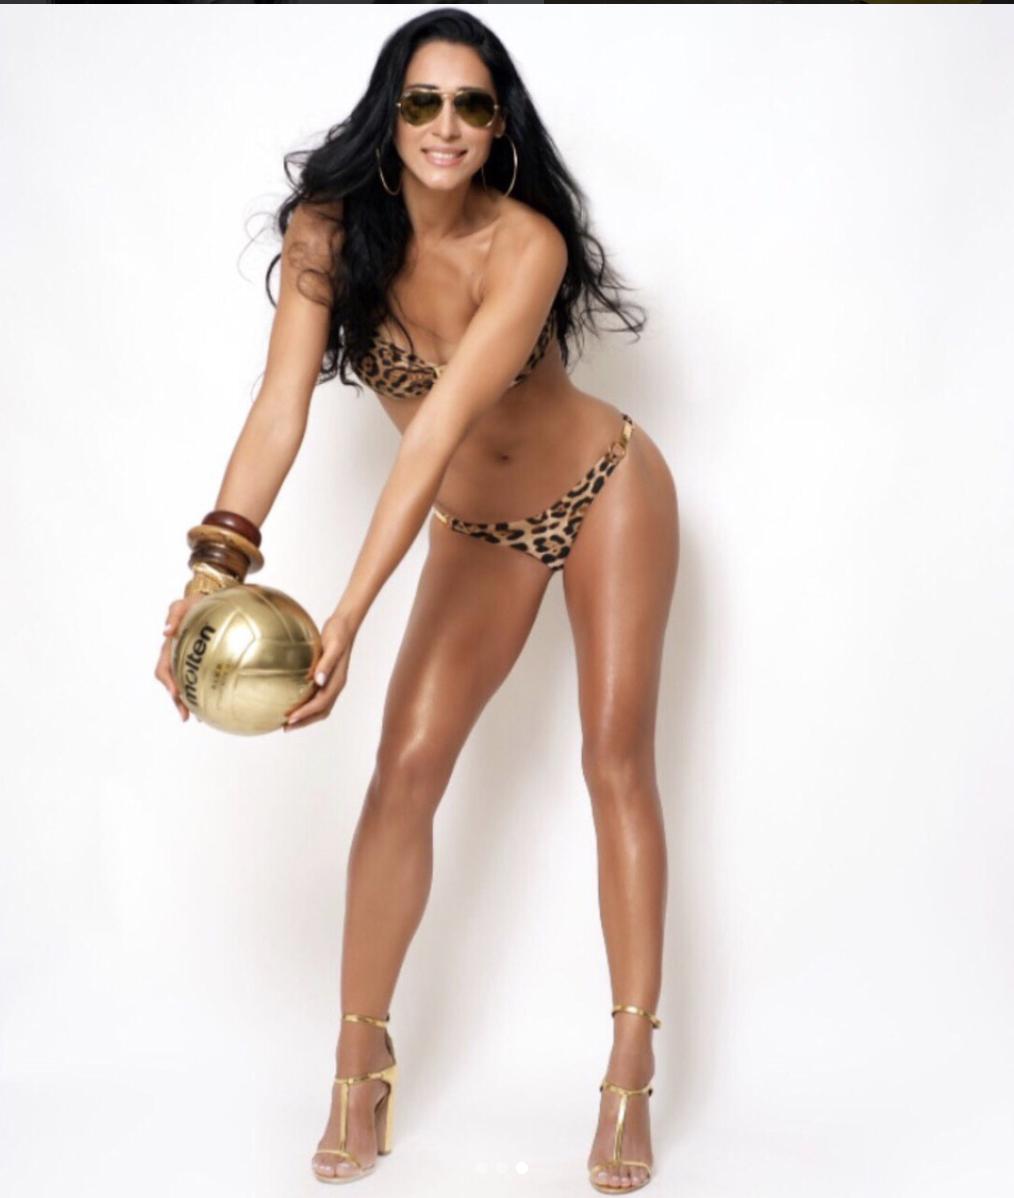 Nackt  Jaqueline Carvalho Stunning pictures